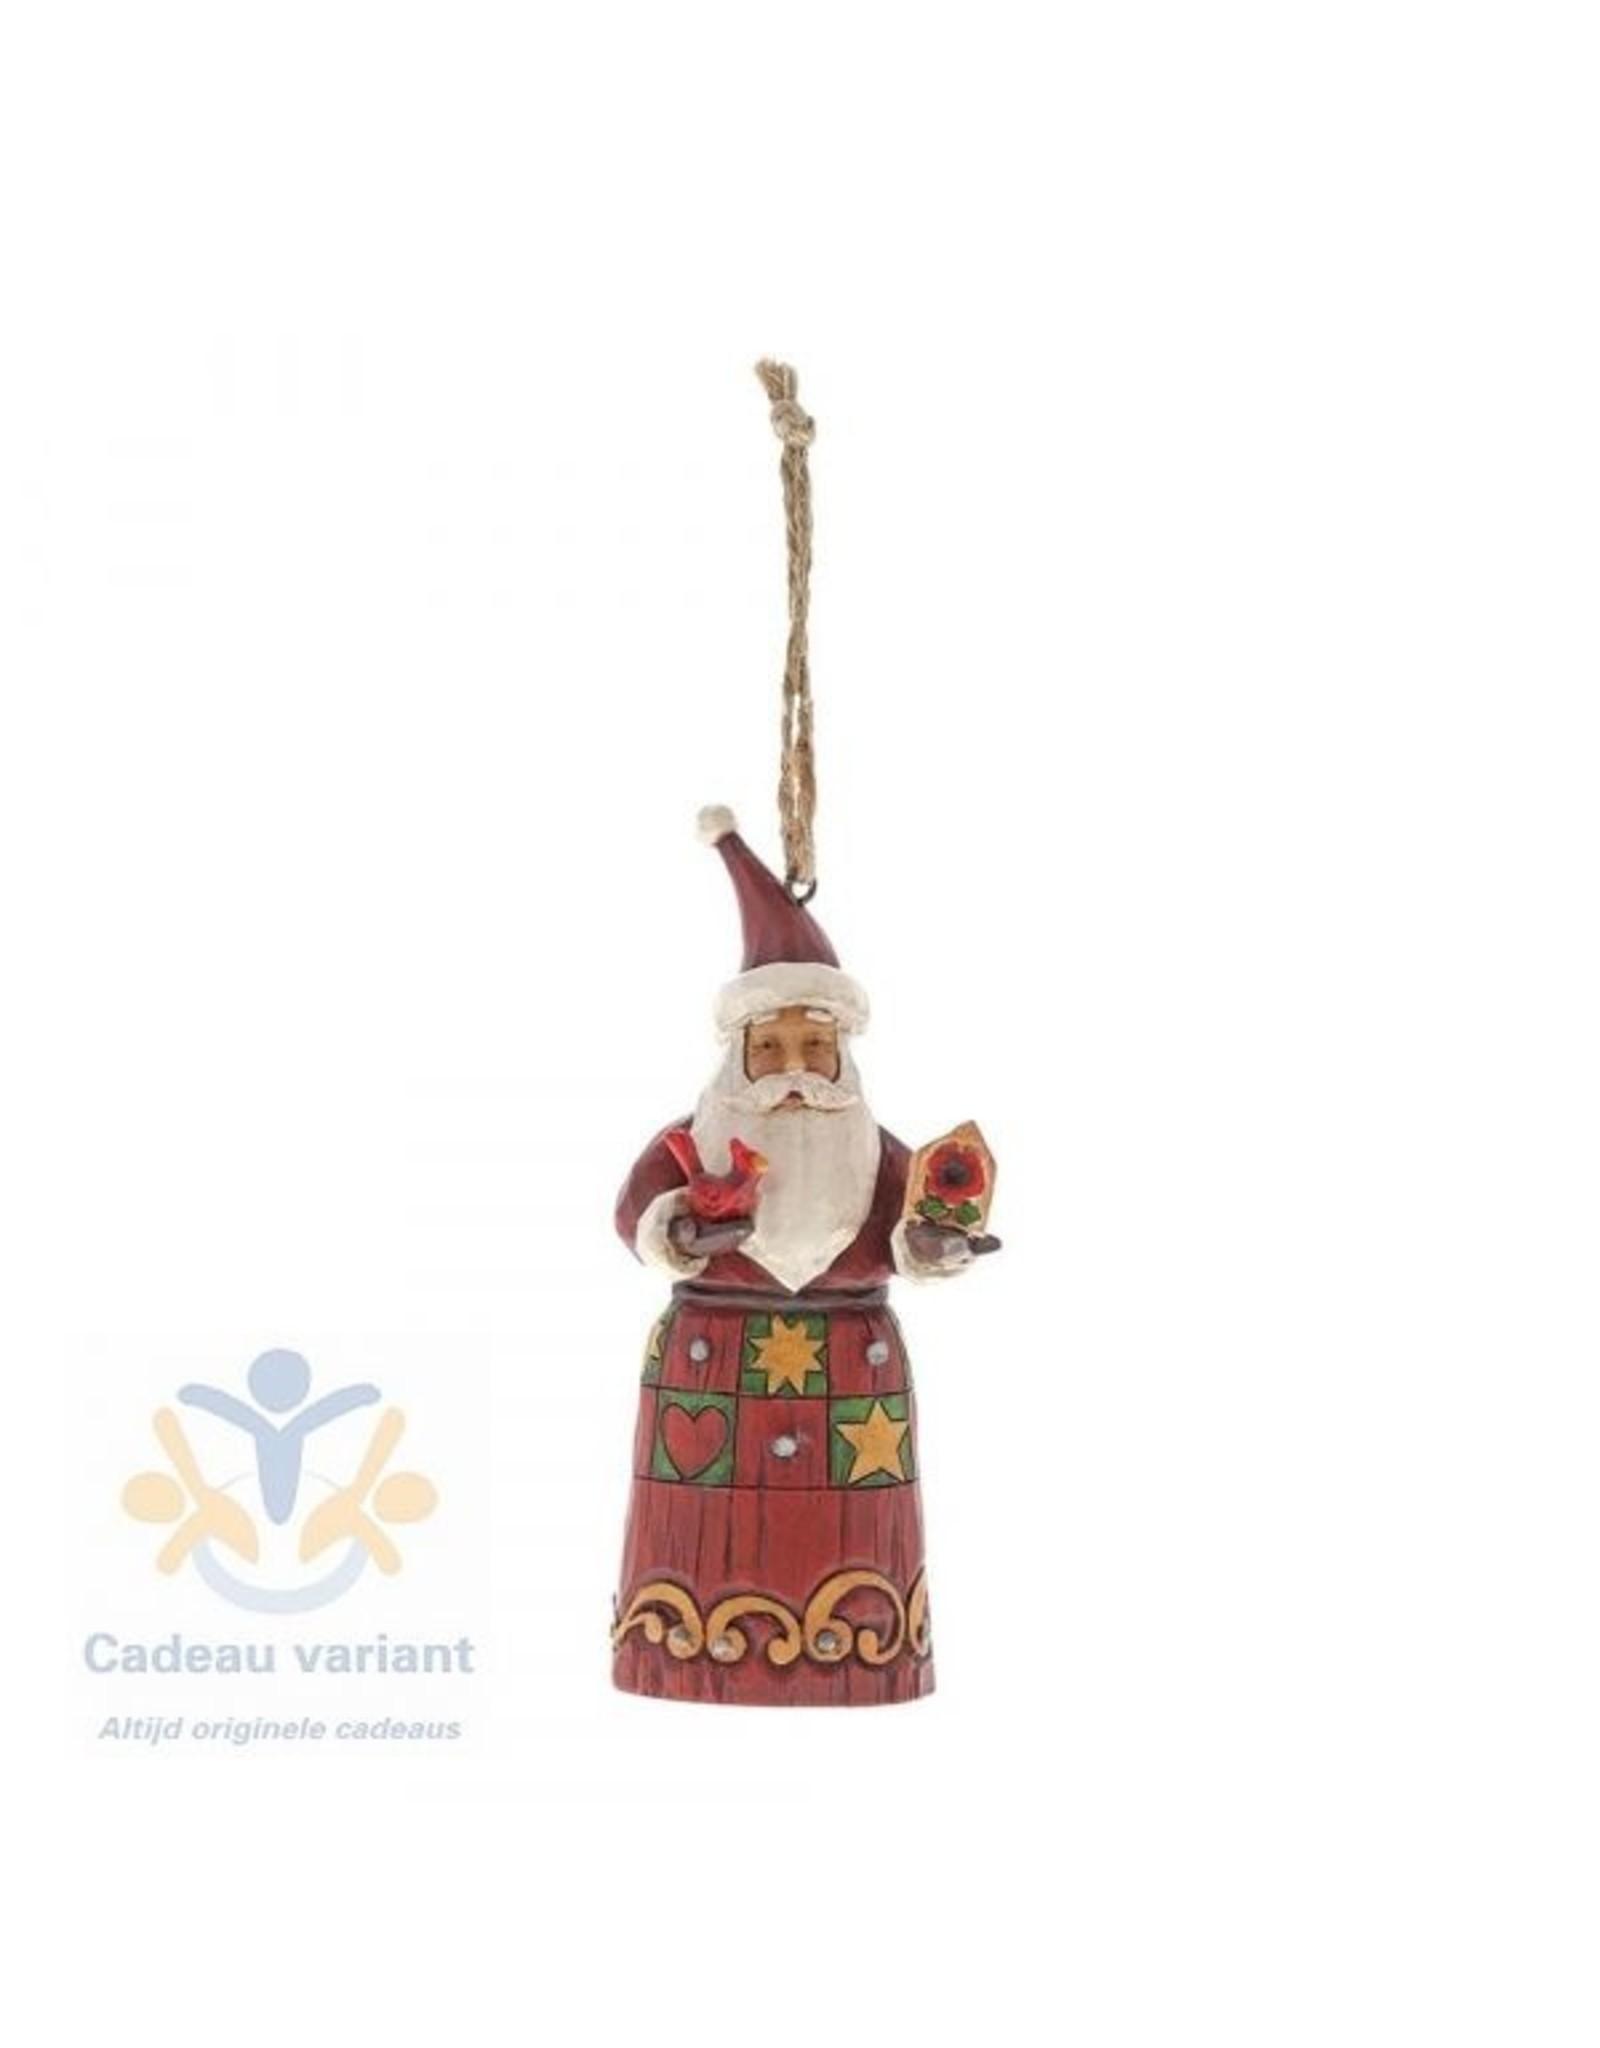 Jim Shore Kerstman folklore met vogelhuisje ornament